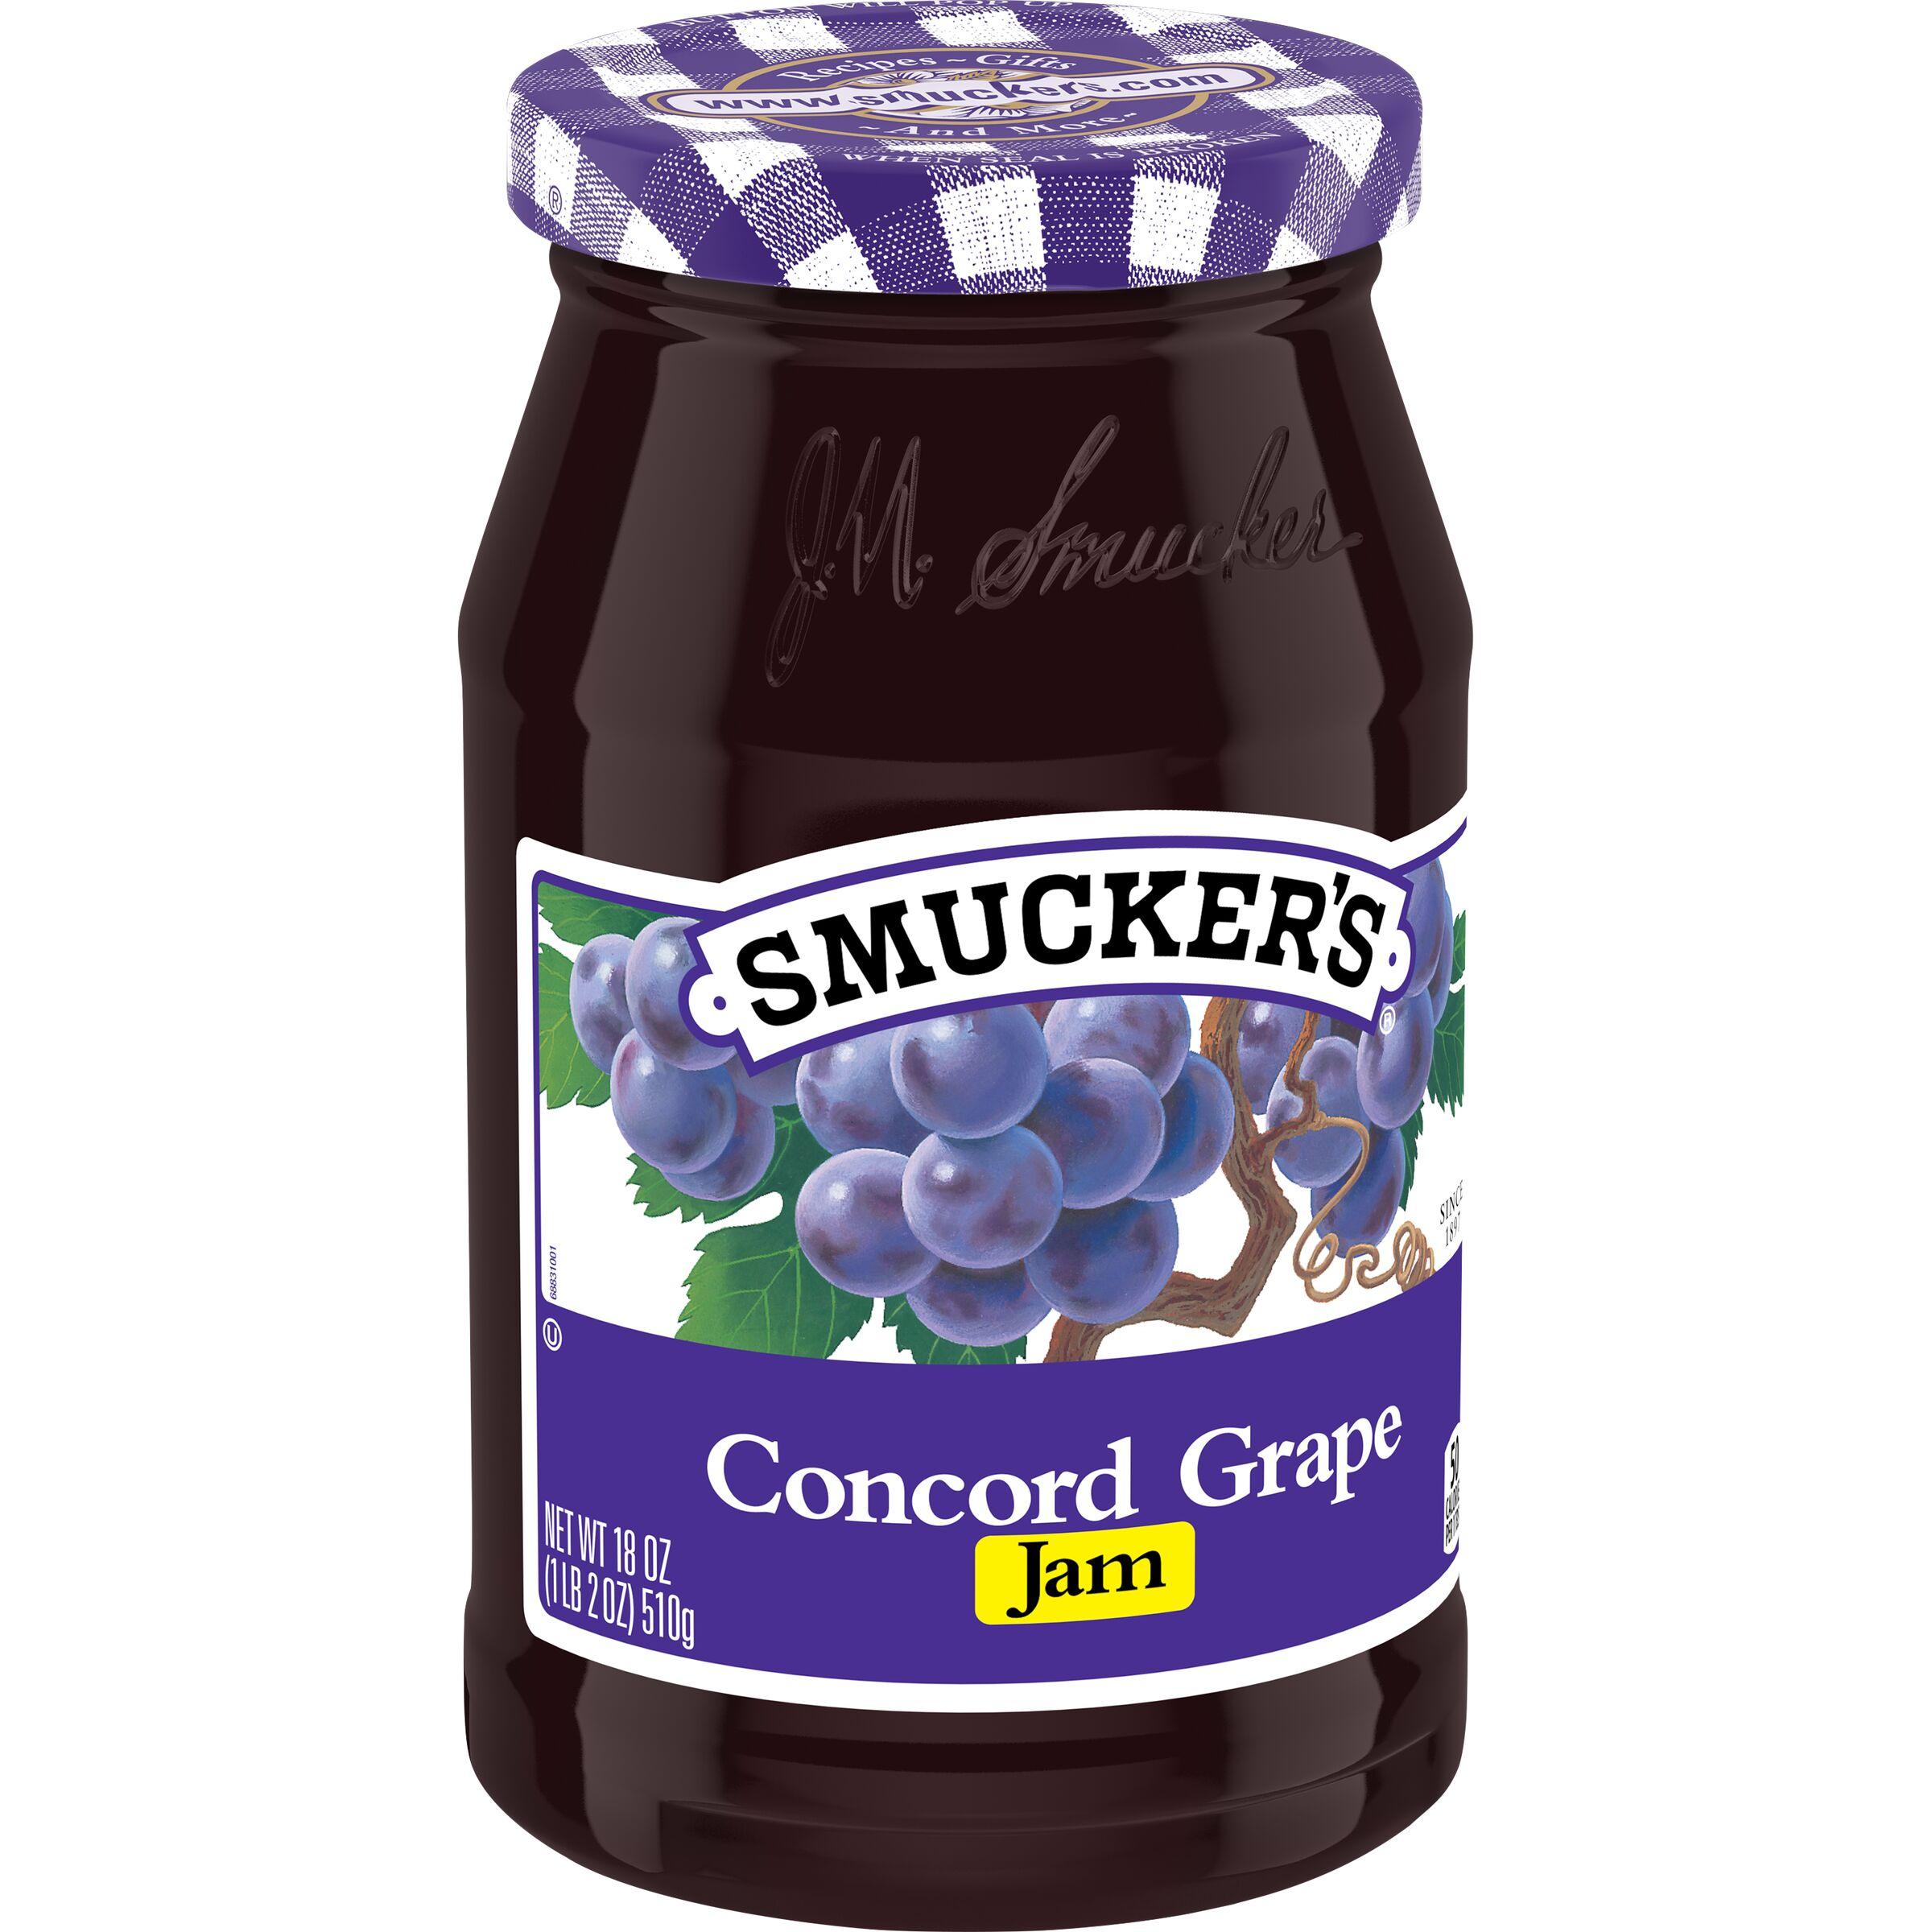 Smucker's  Concord Grape Jam